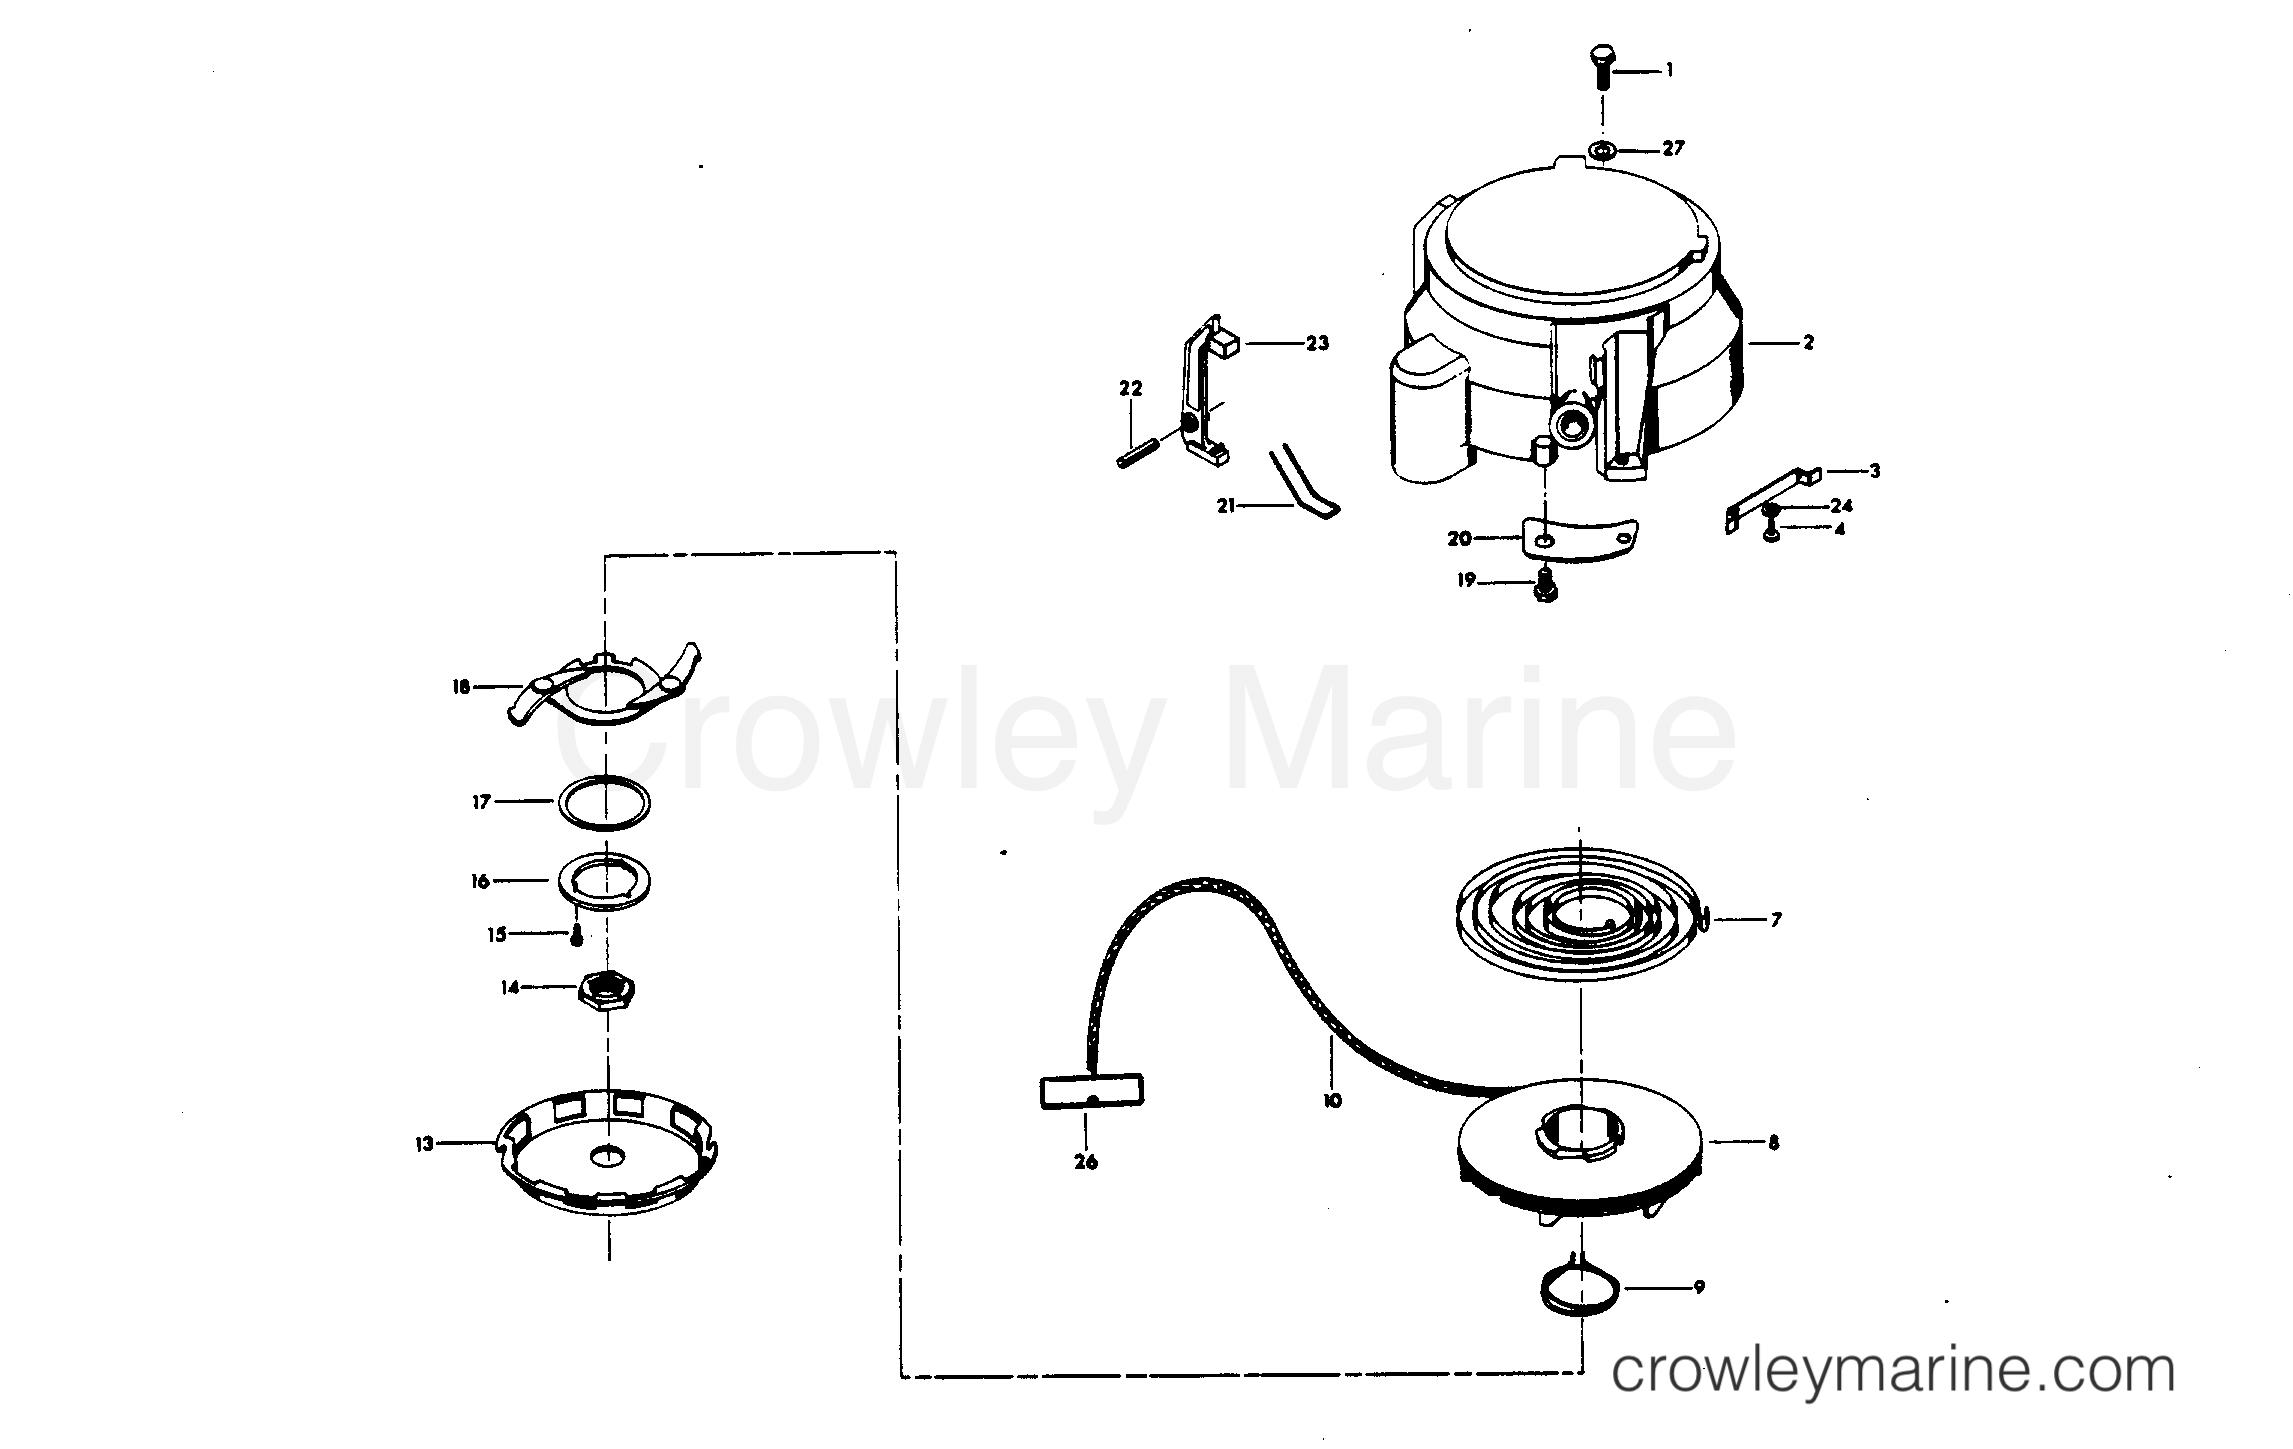 1980 Chrysler Outboard 30 - 307B0C - HAND STARTER section